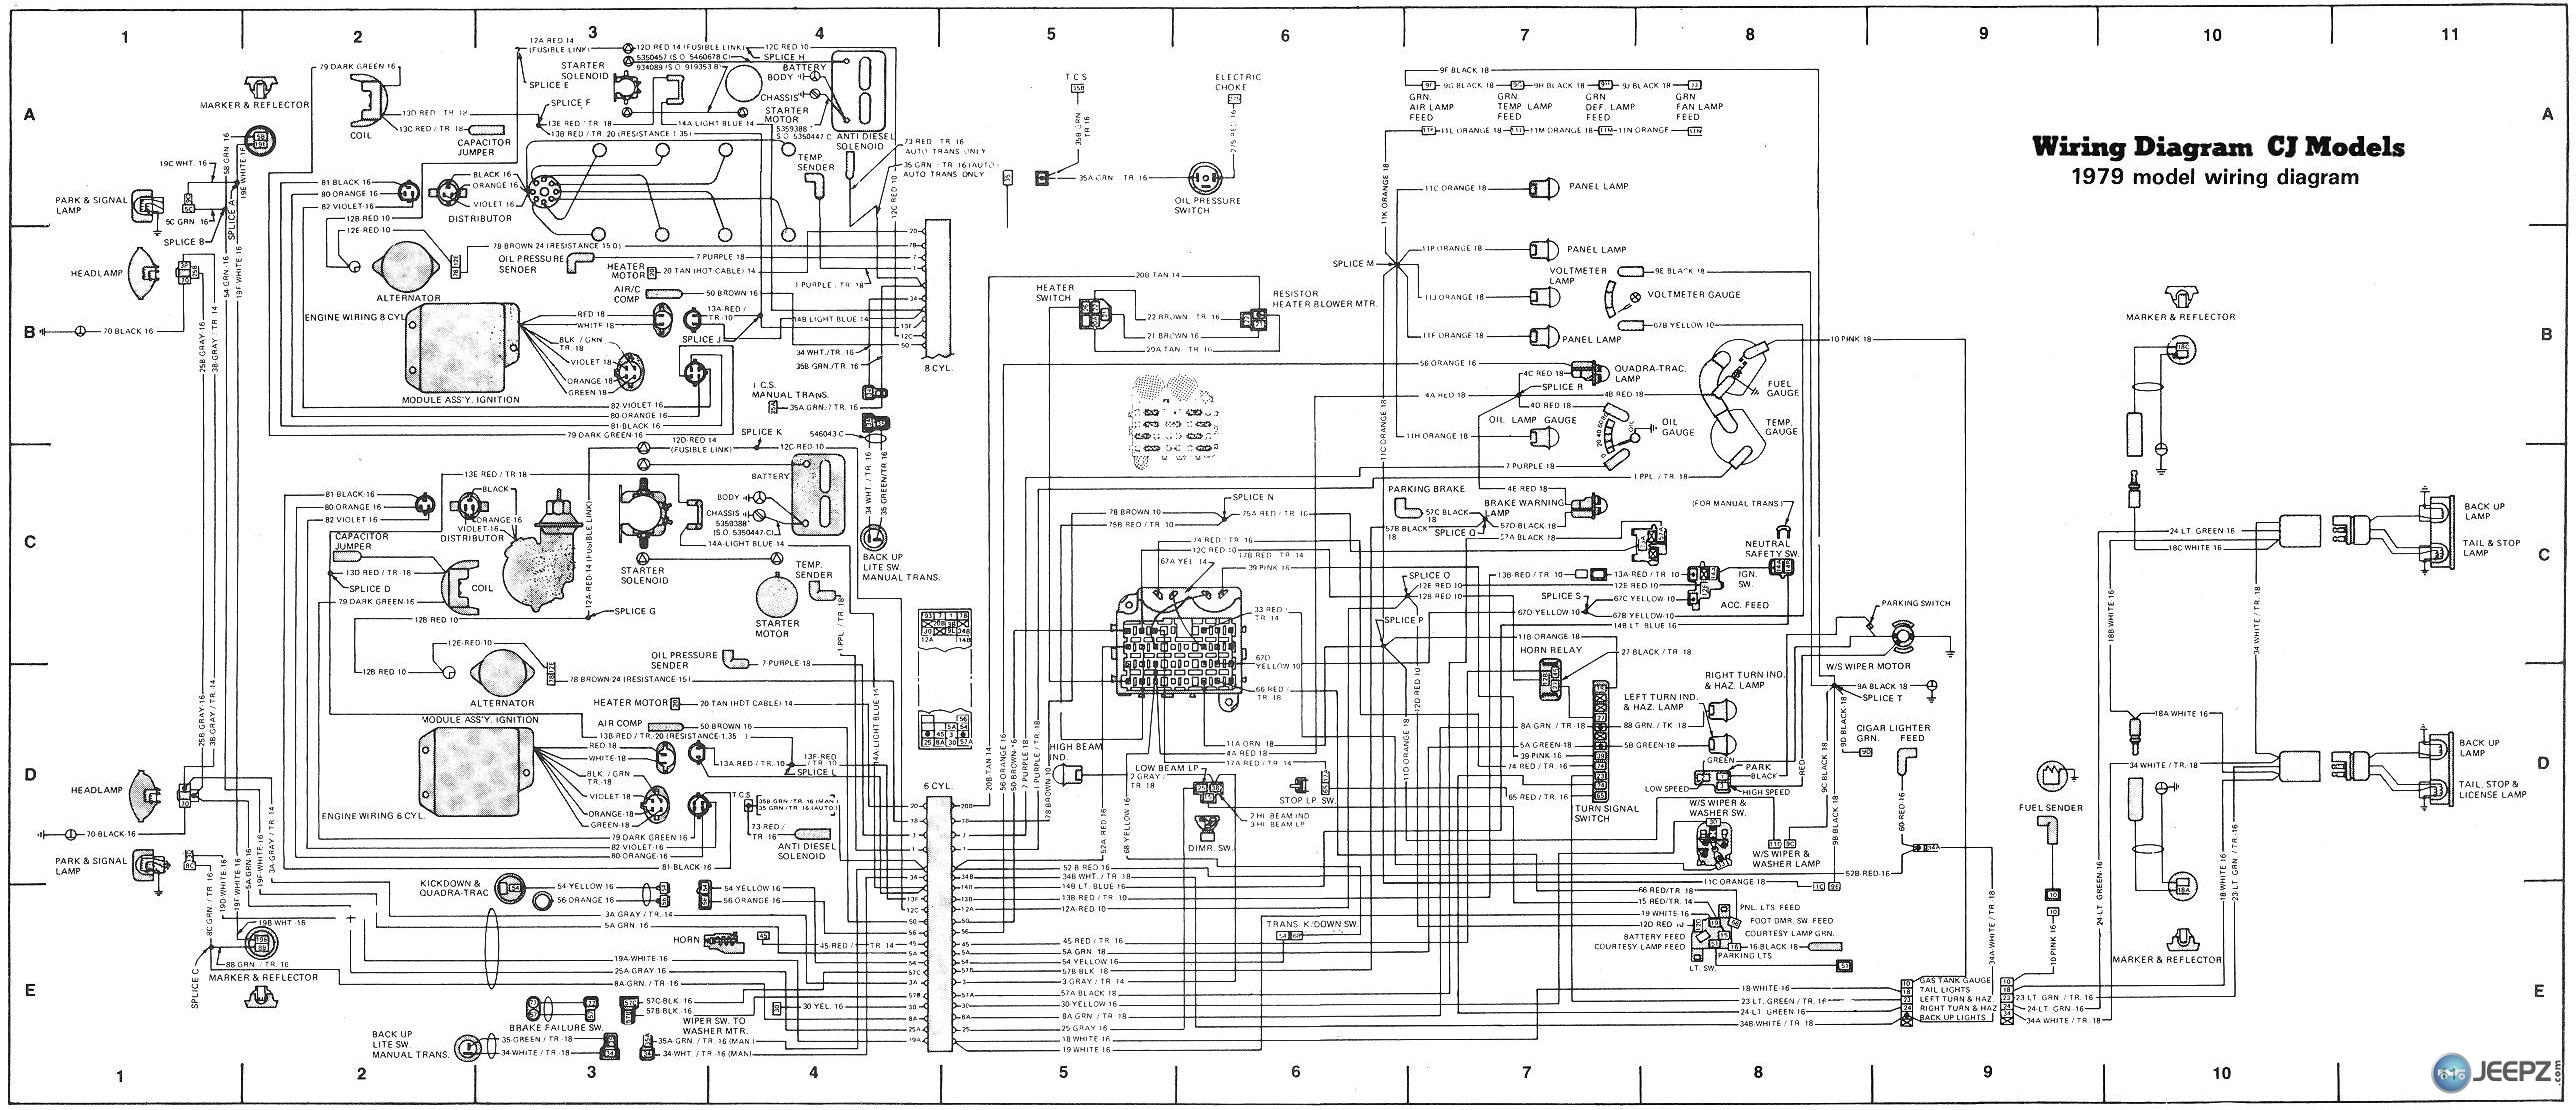 Remarkable Wiring Diagram For Cj8 Blog Diagram Schema Wiring Cloud Overrenstrafr09Org